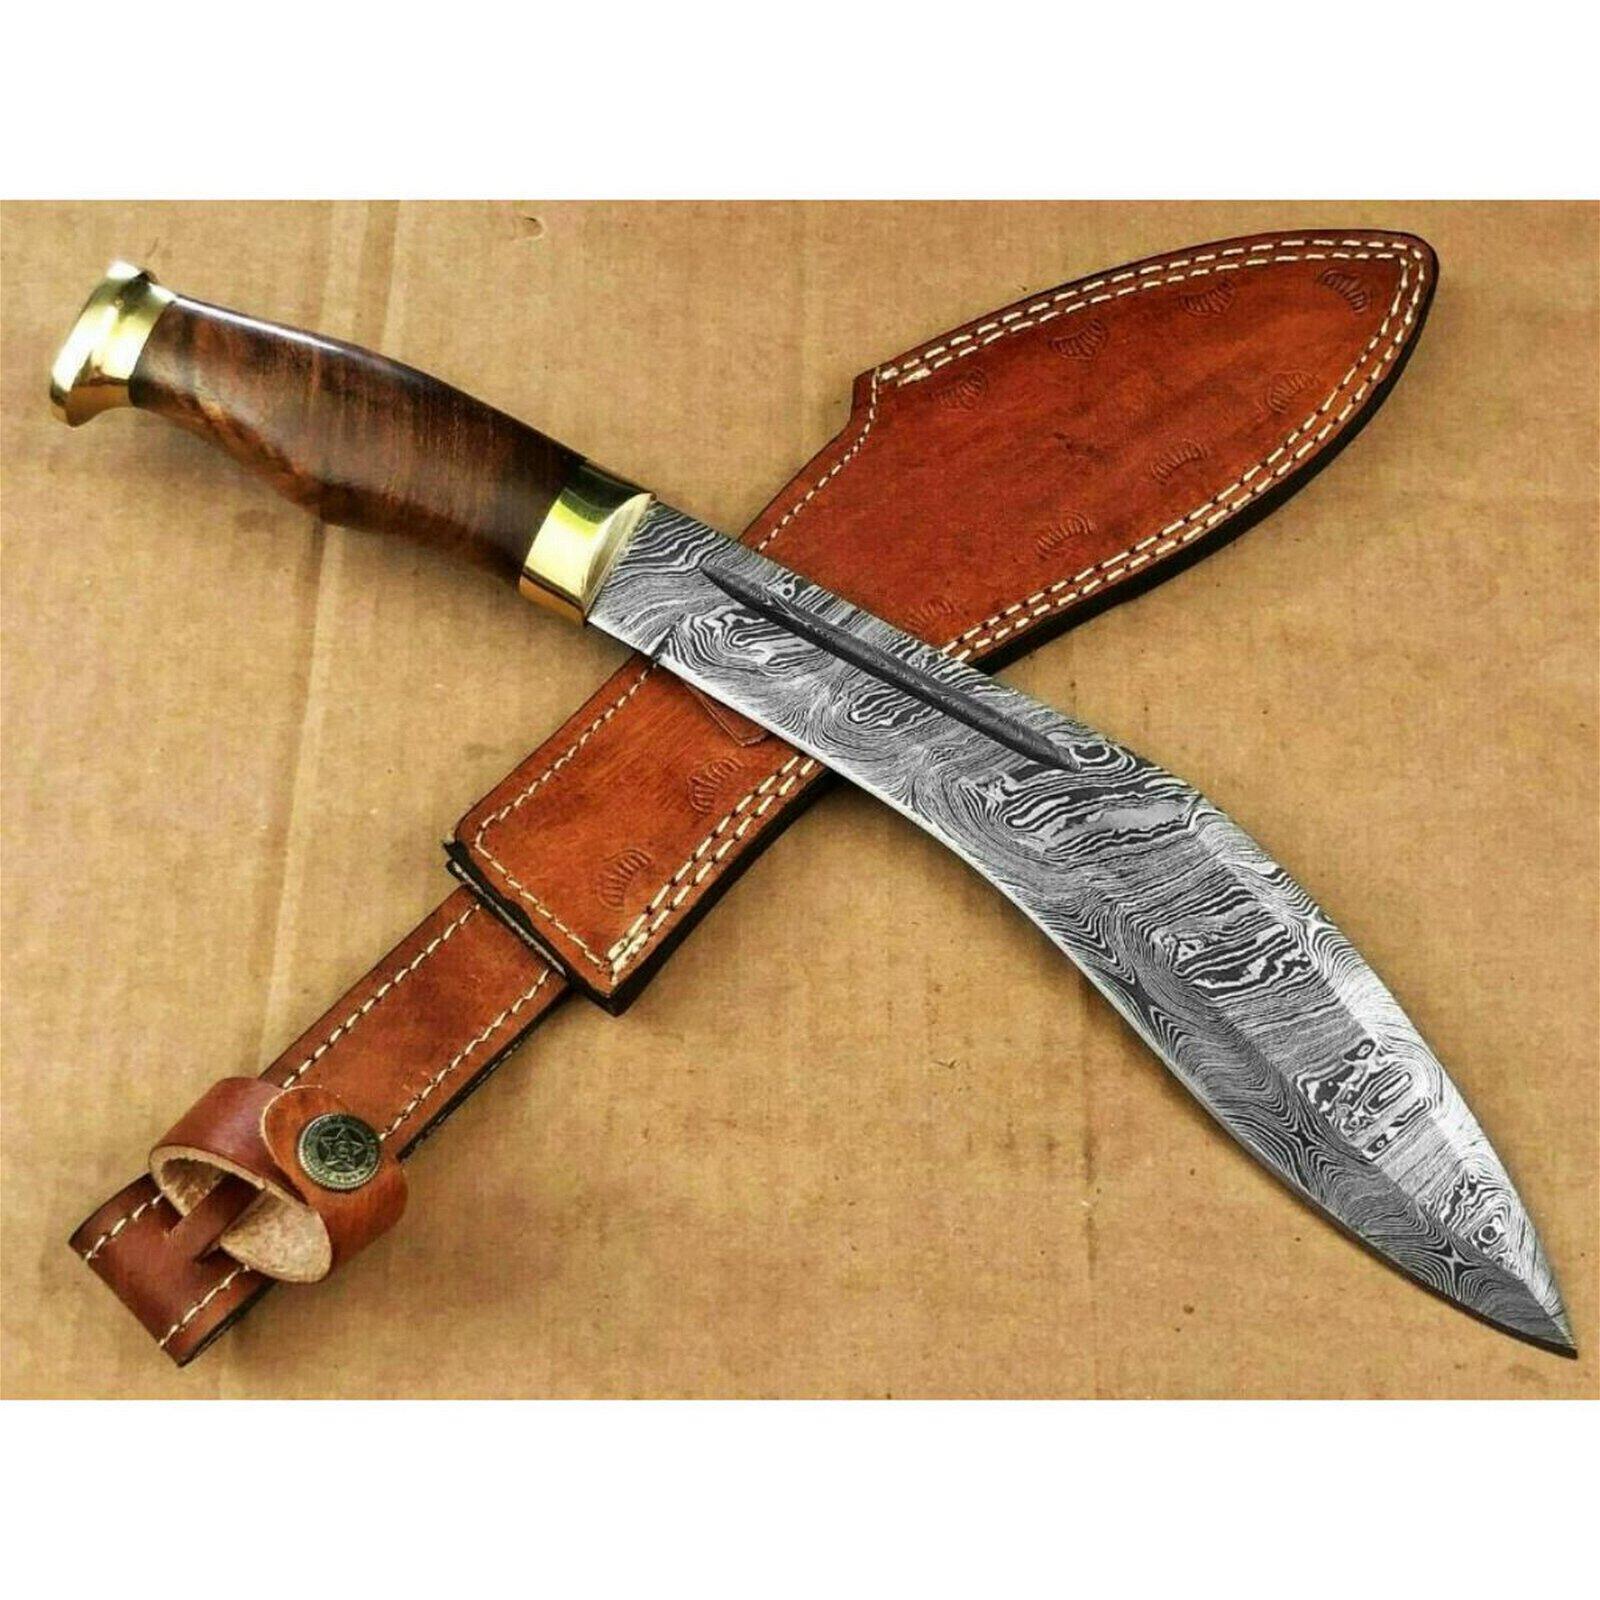 Ash da91 damascus steel custom handmade hunting kukri